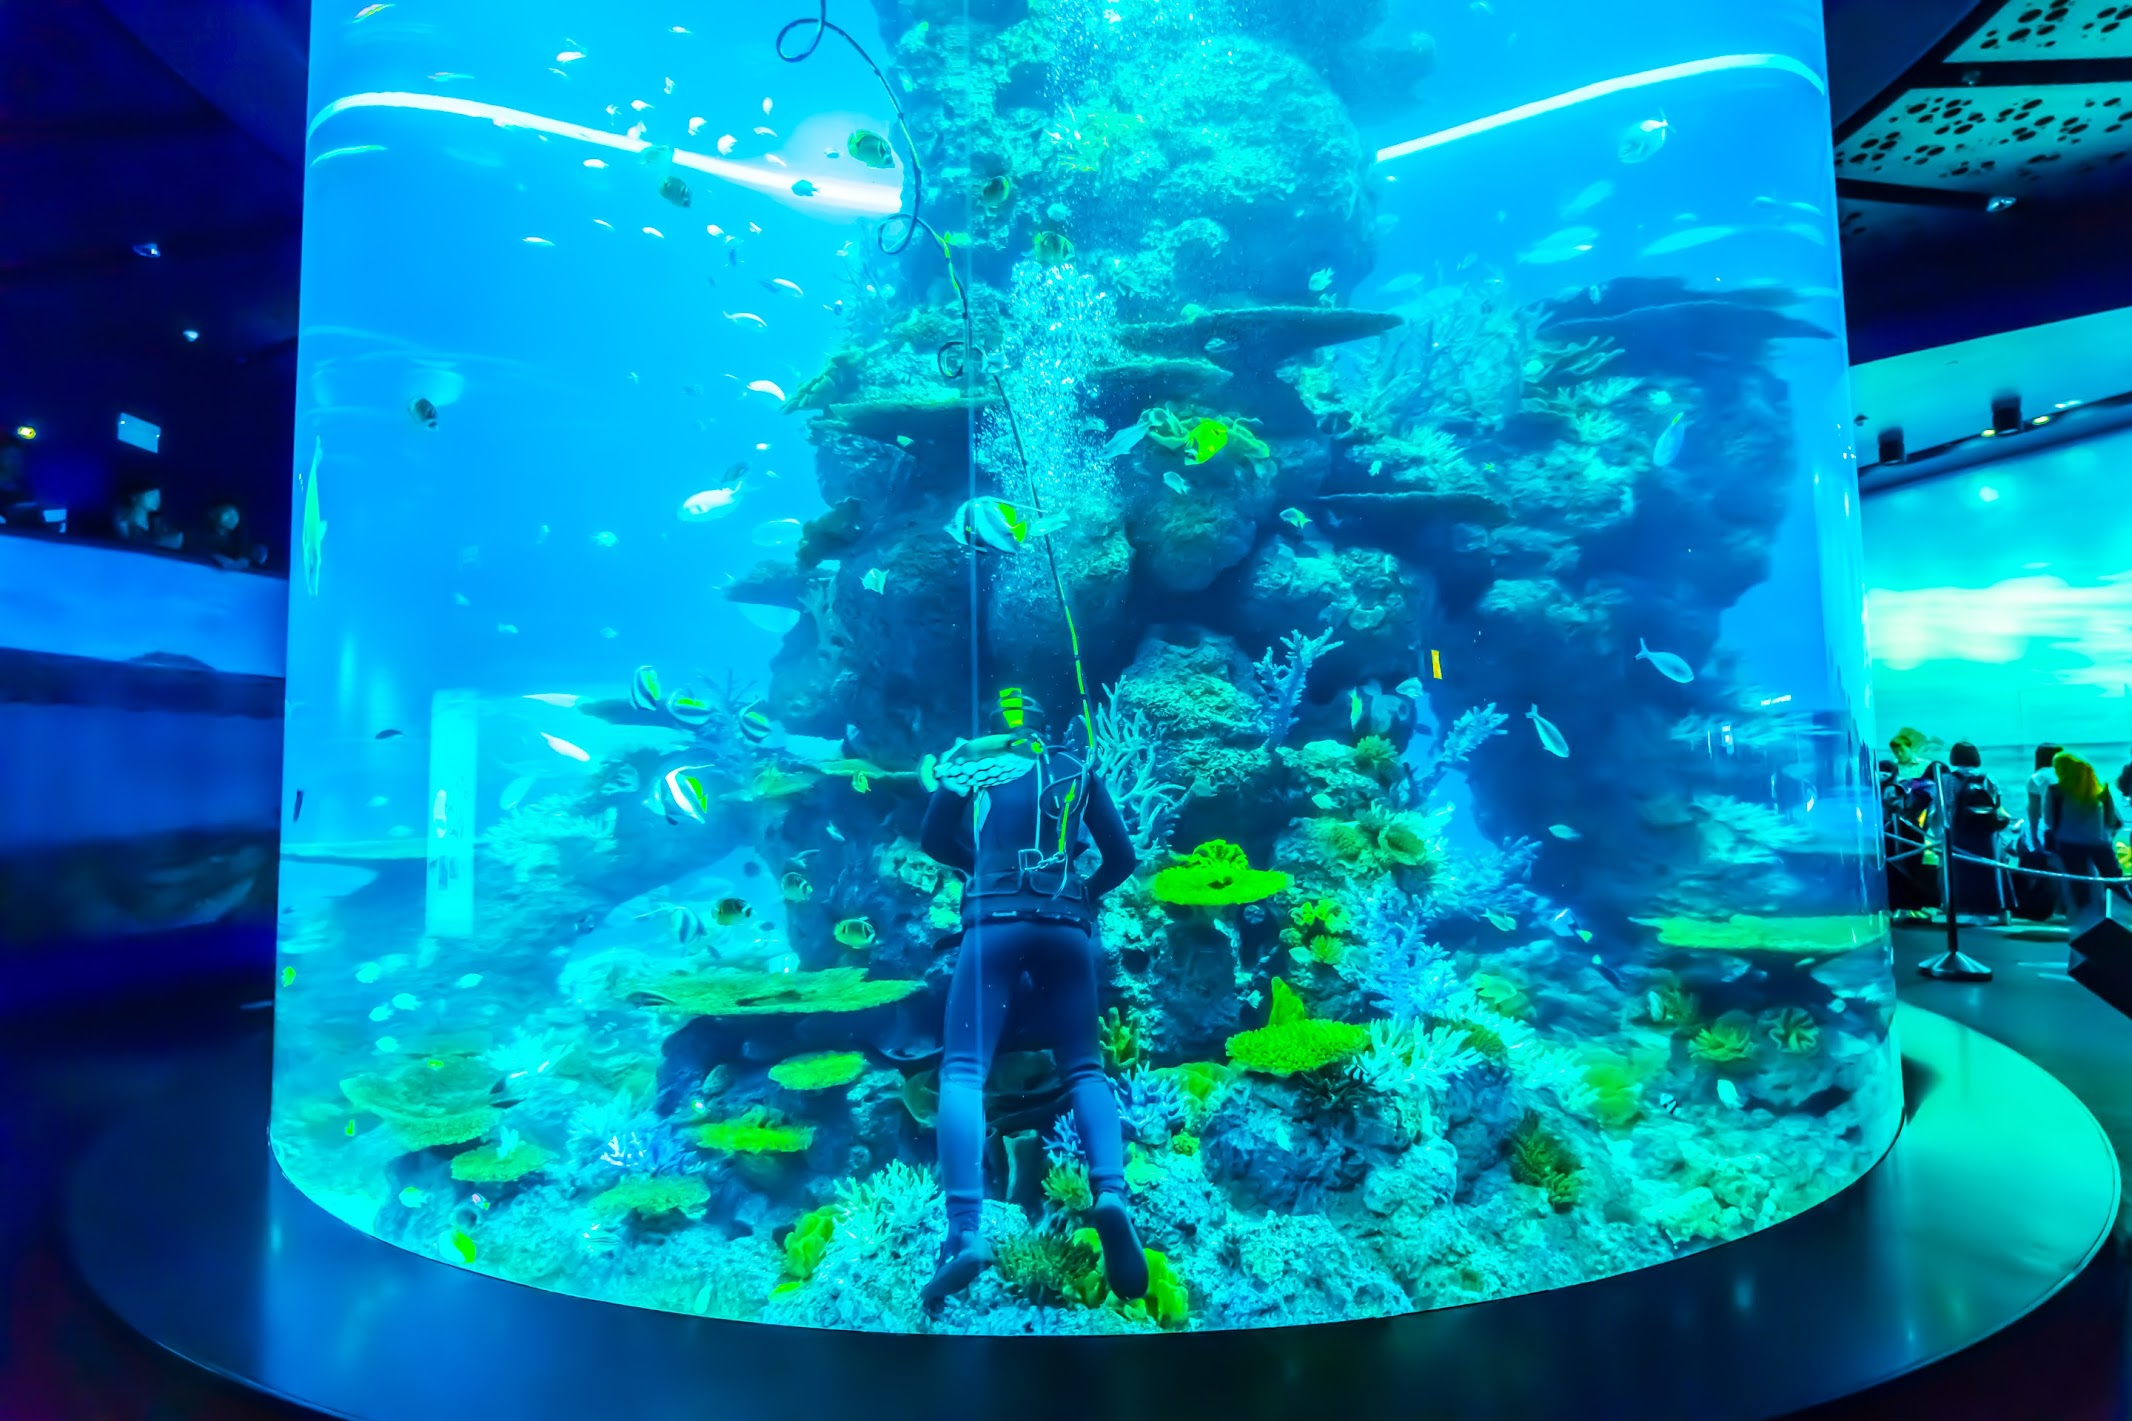 Singapore Sentosa S.E.A. Aquarium Coral Garden1